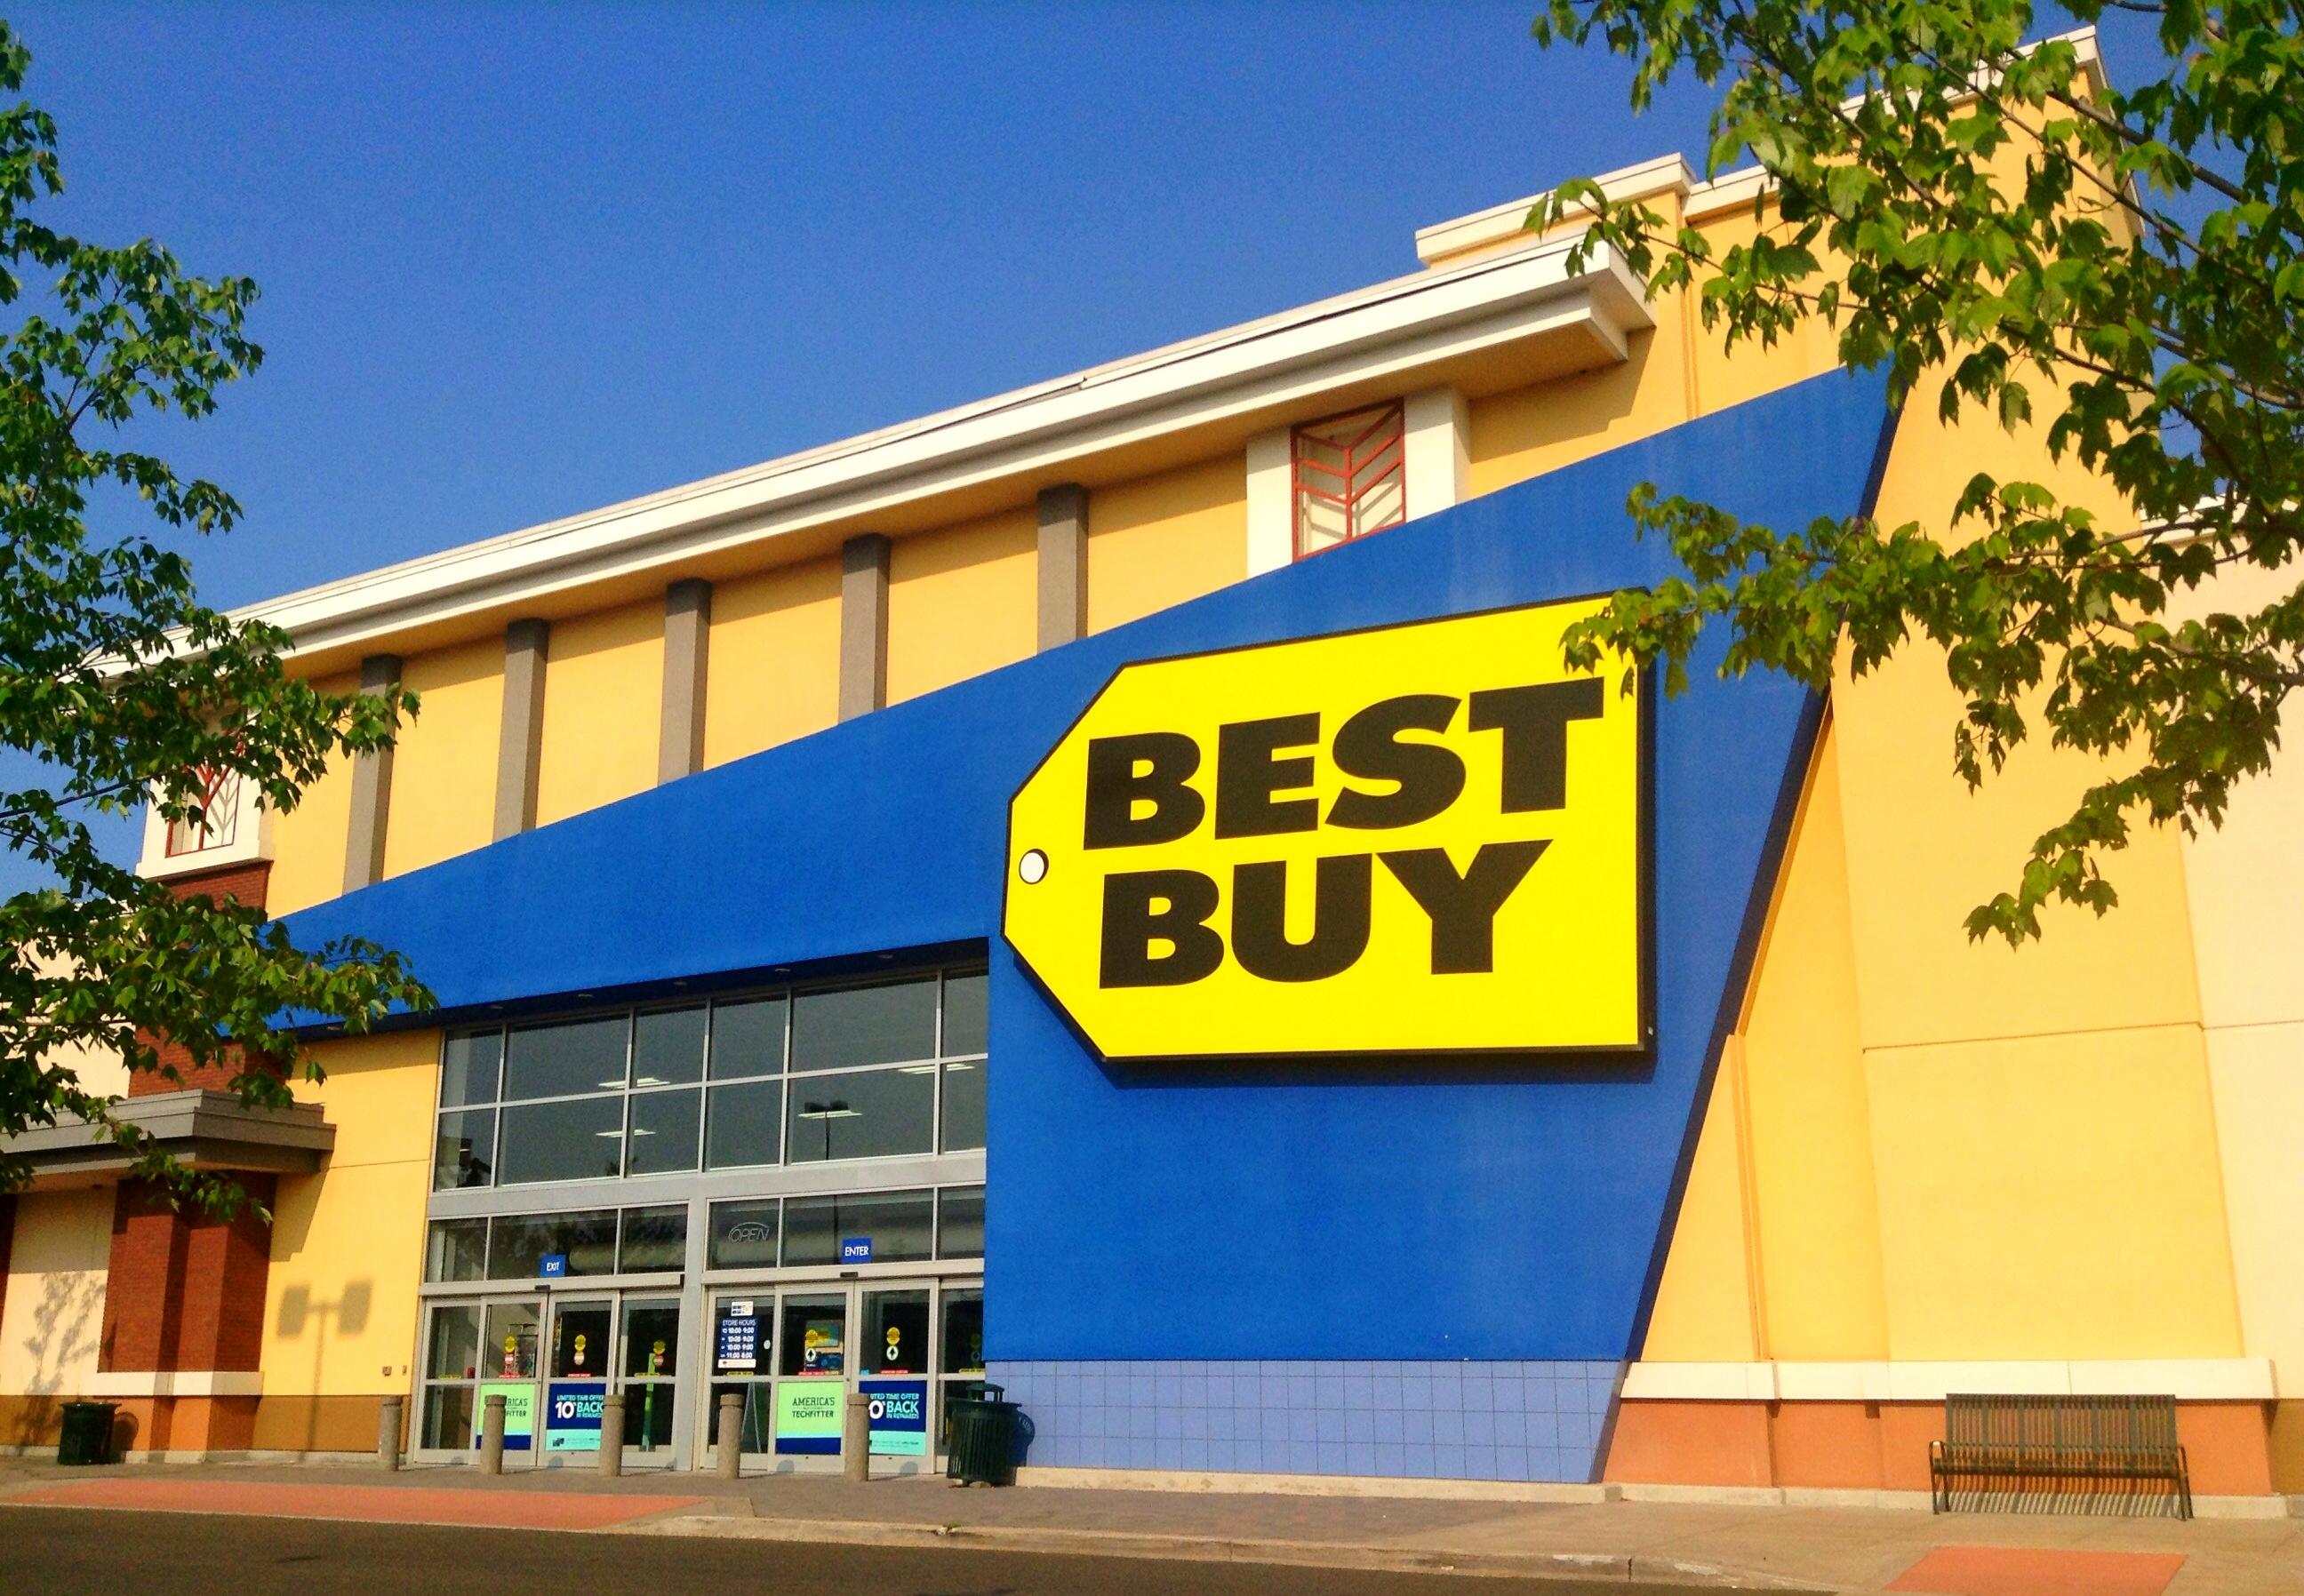 BestBuy Stores - m.facebook.com